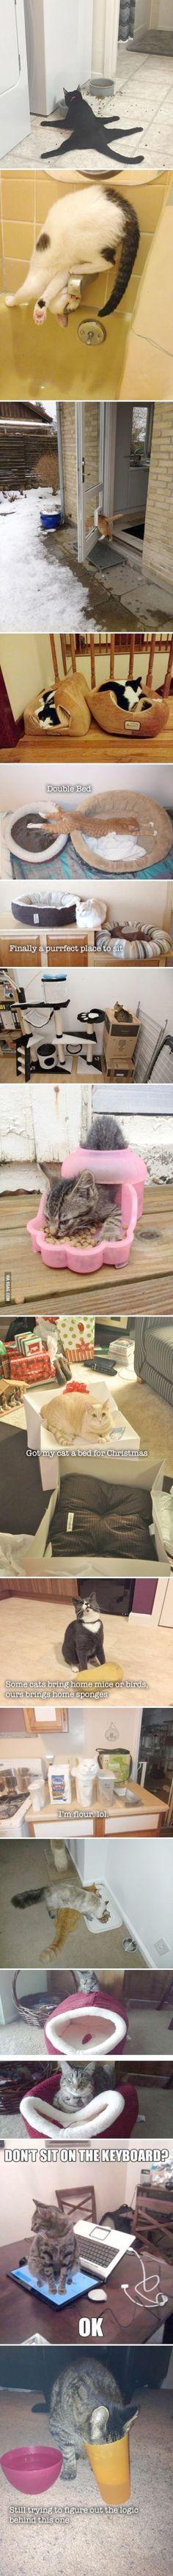 Funny Cat Picture Tumblr #pinterest